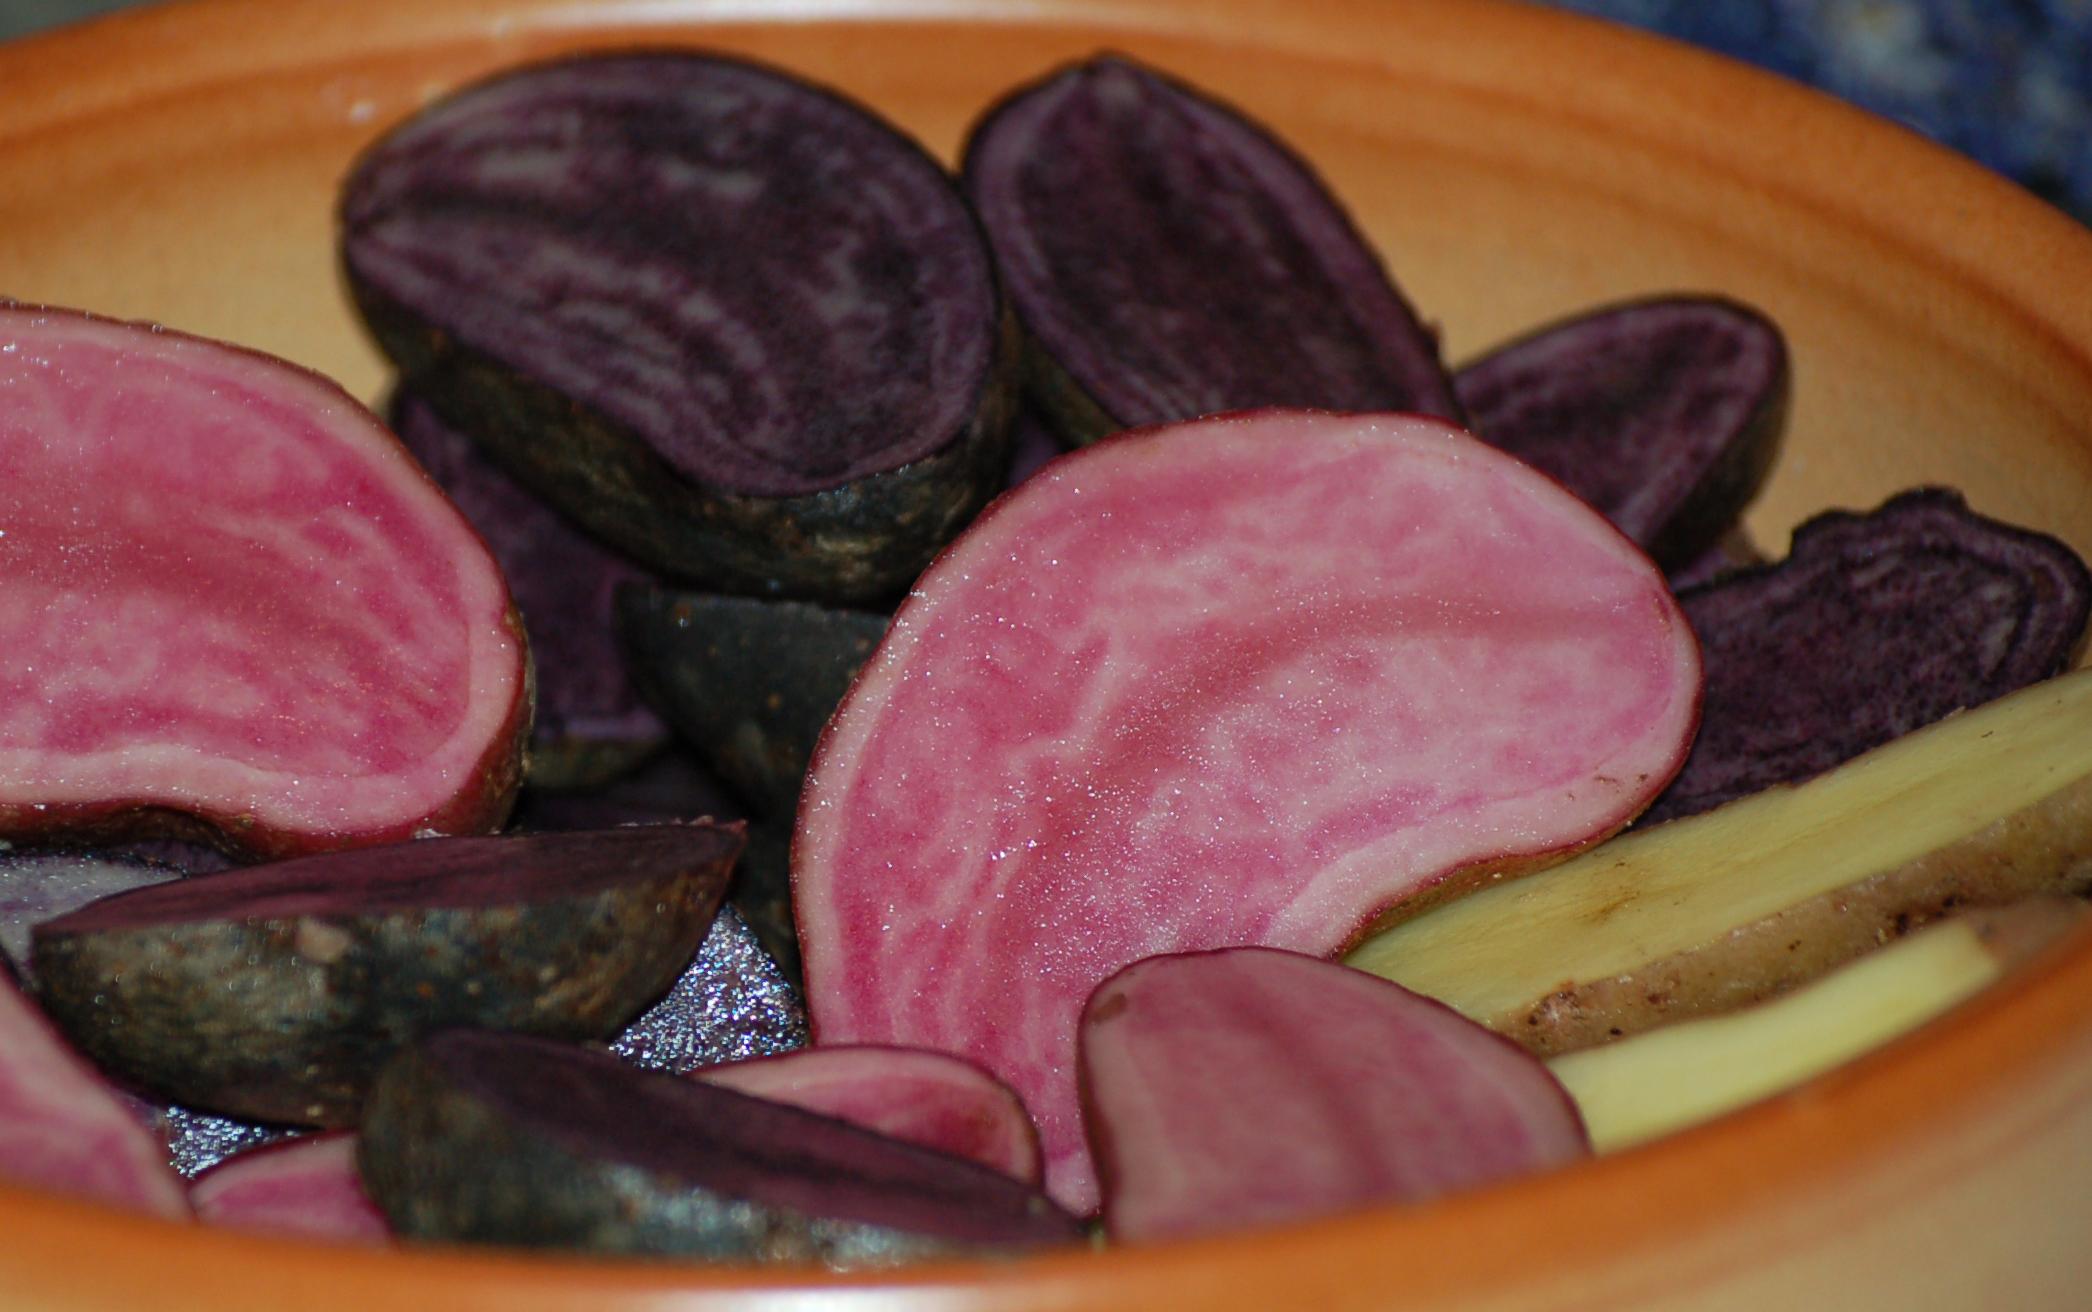 Kartoffelraritäten RoteEmma(rosa) BlaueElise RosaTannenzapfen(gelb) (6) Beschnitt web